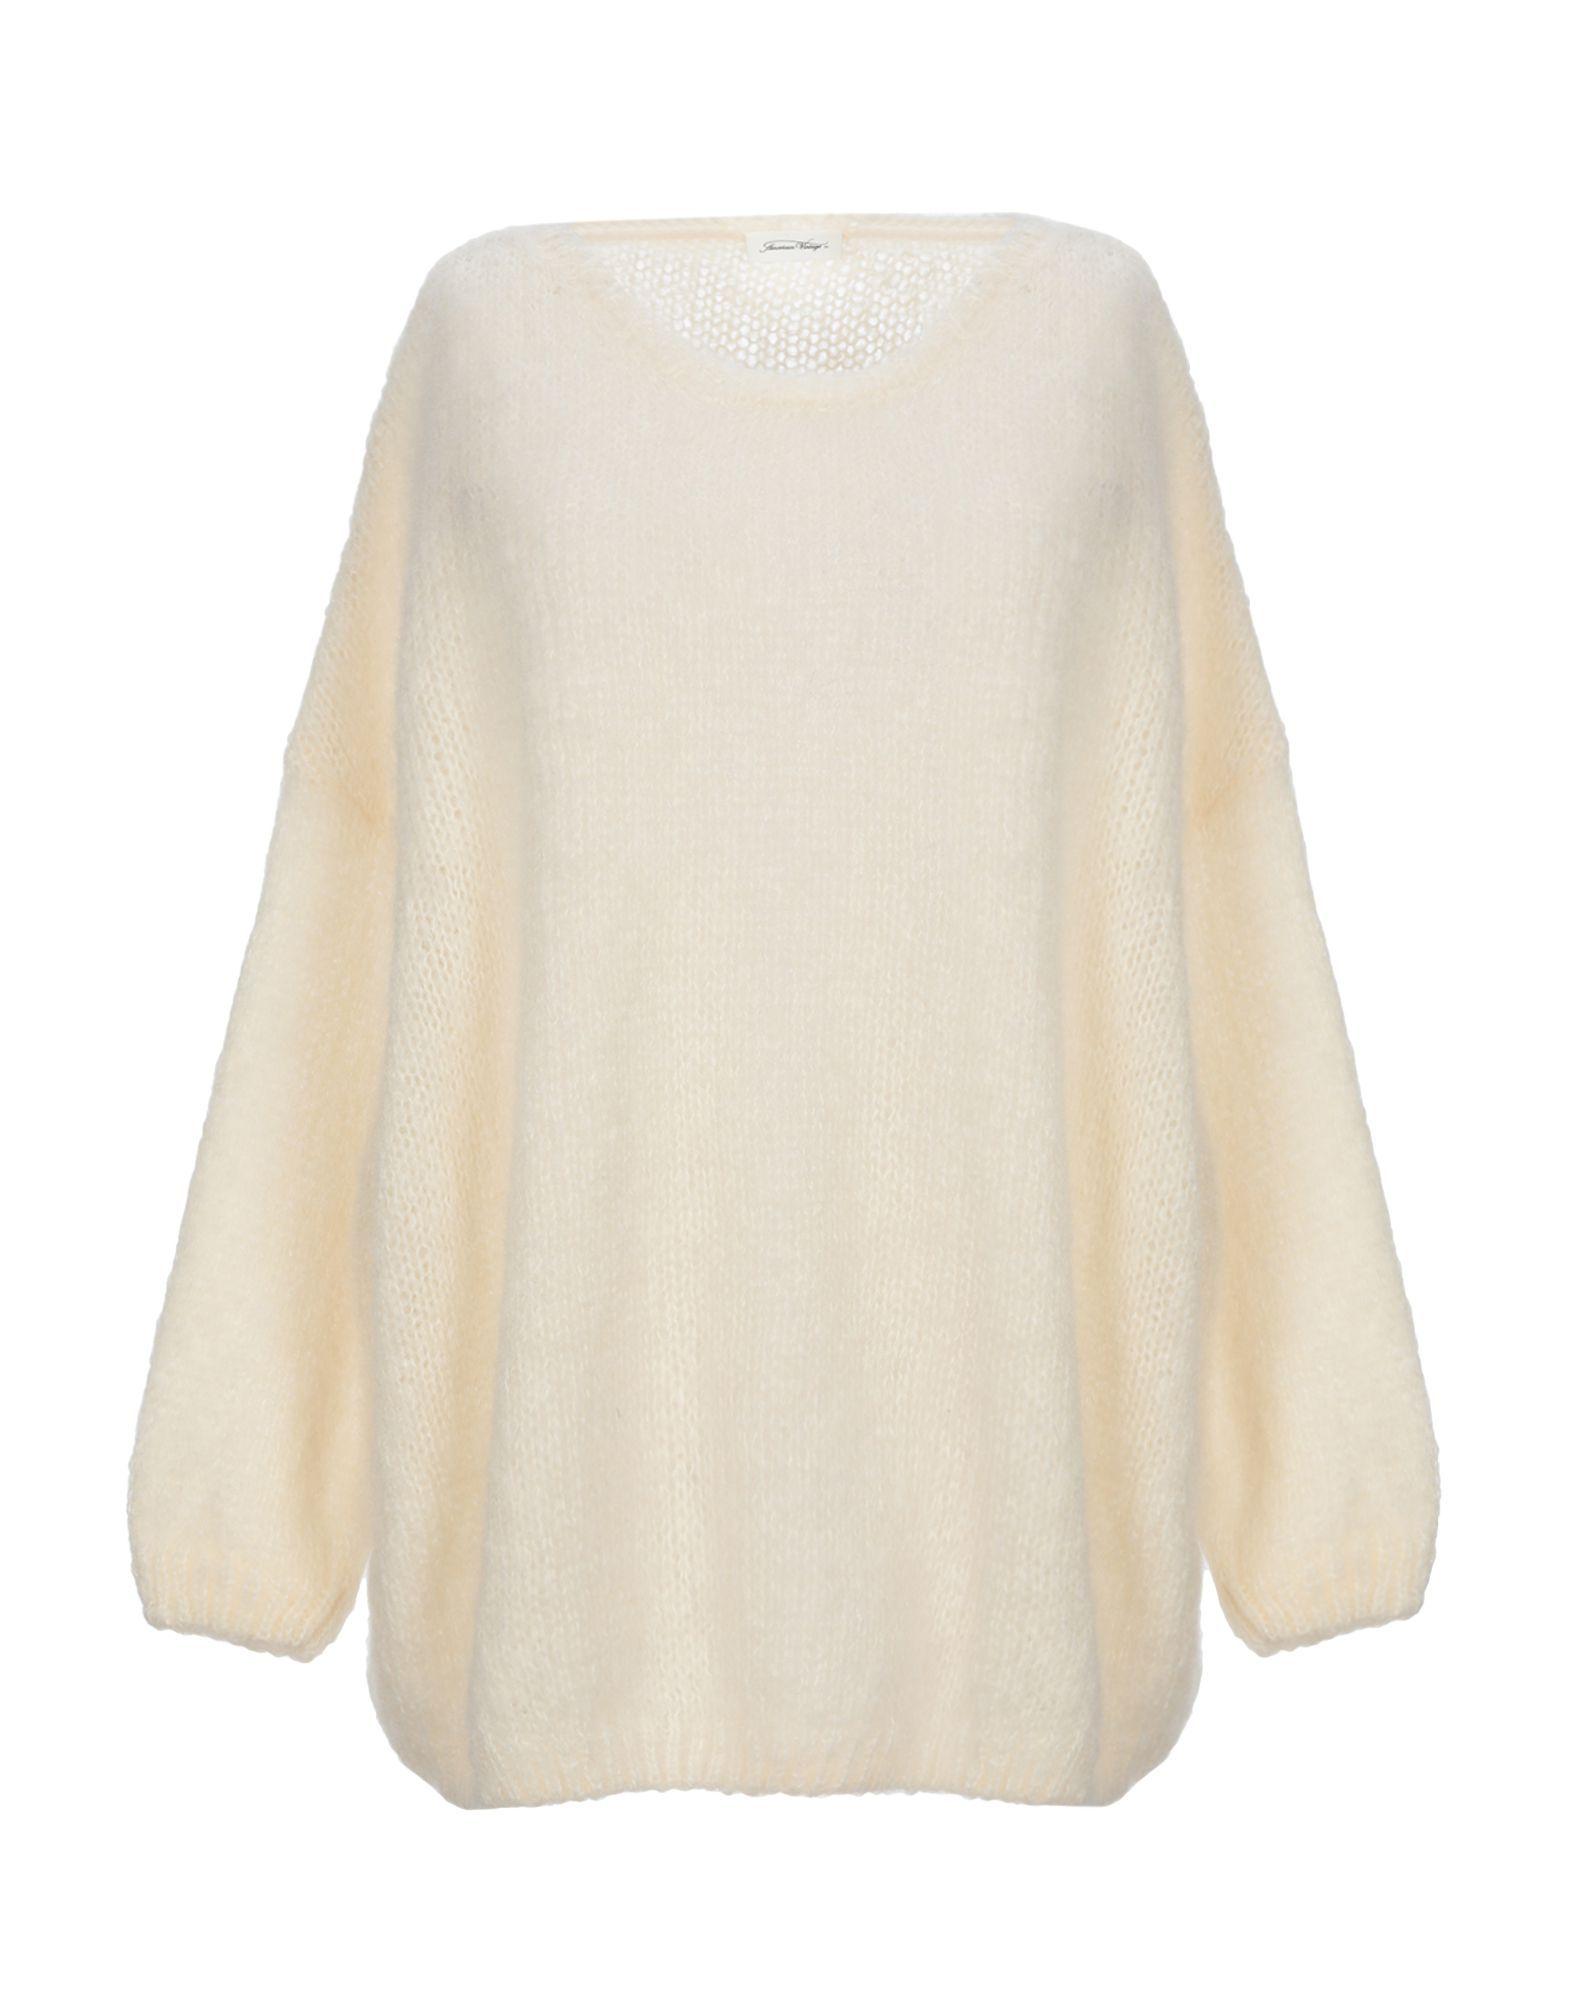 KNITWEAR American Vintage Ivory Woman Mohair wool